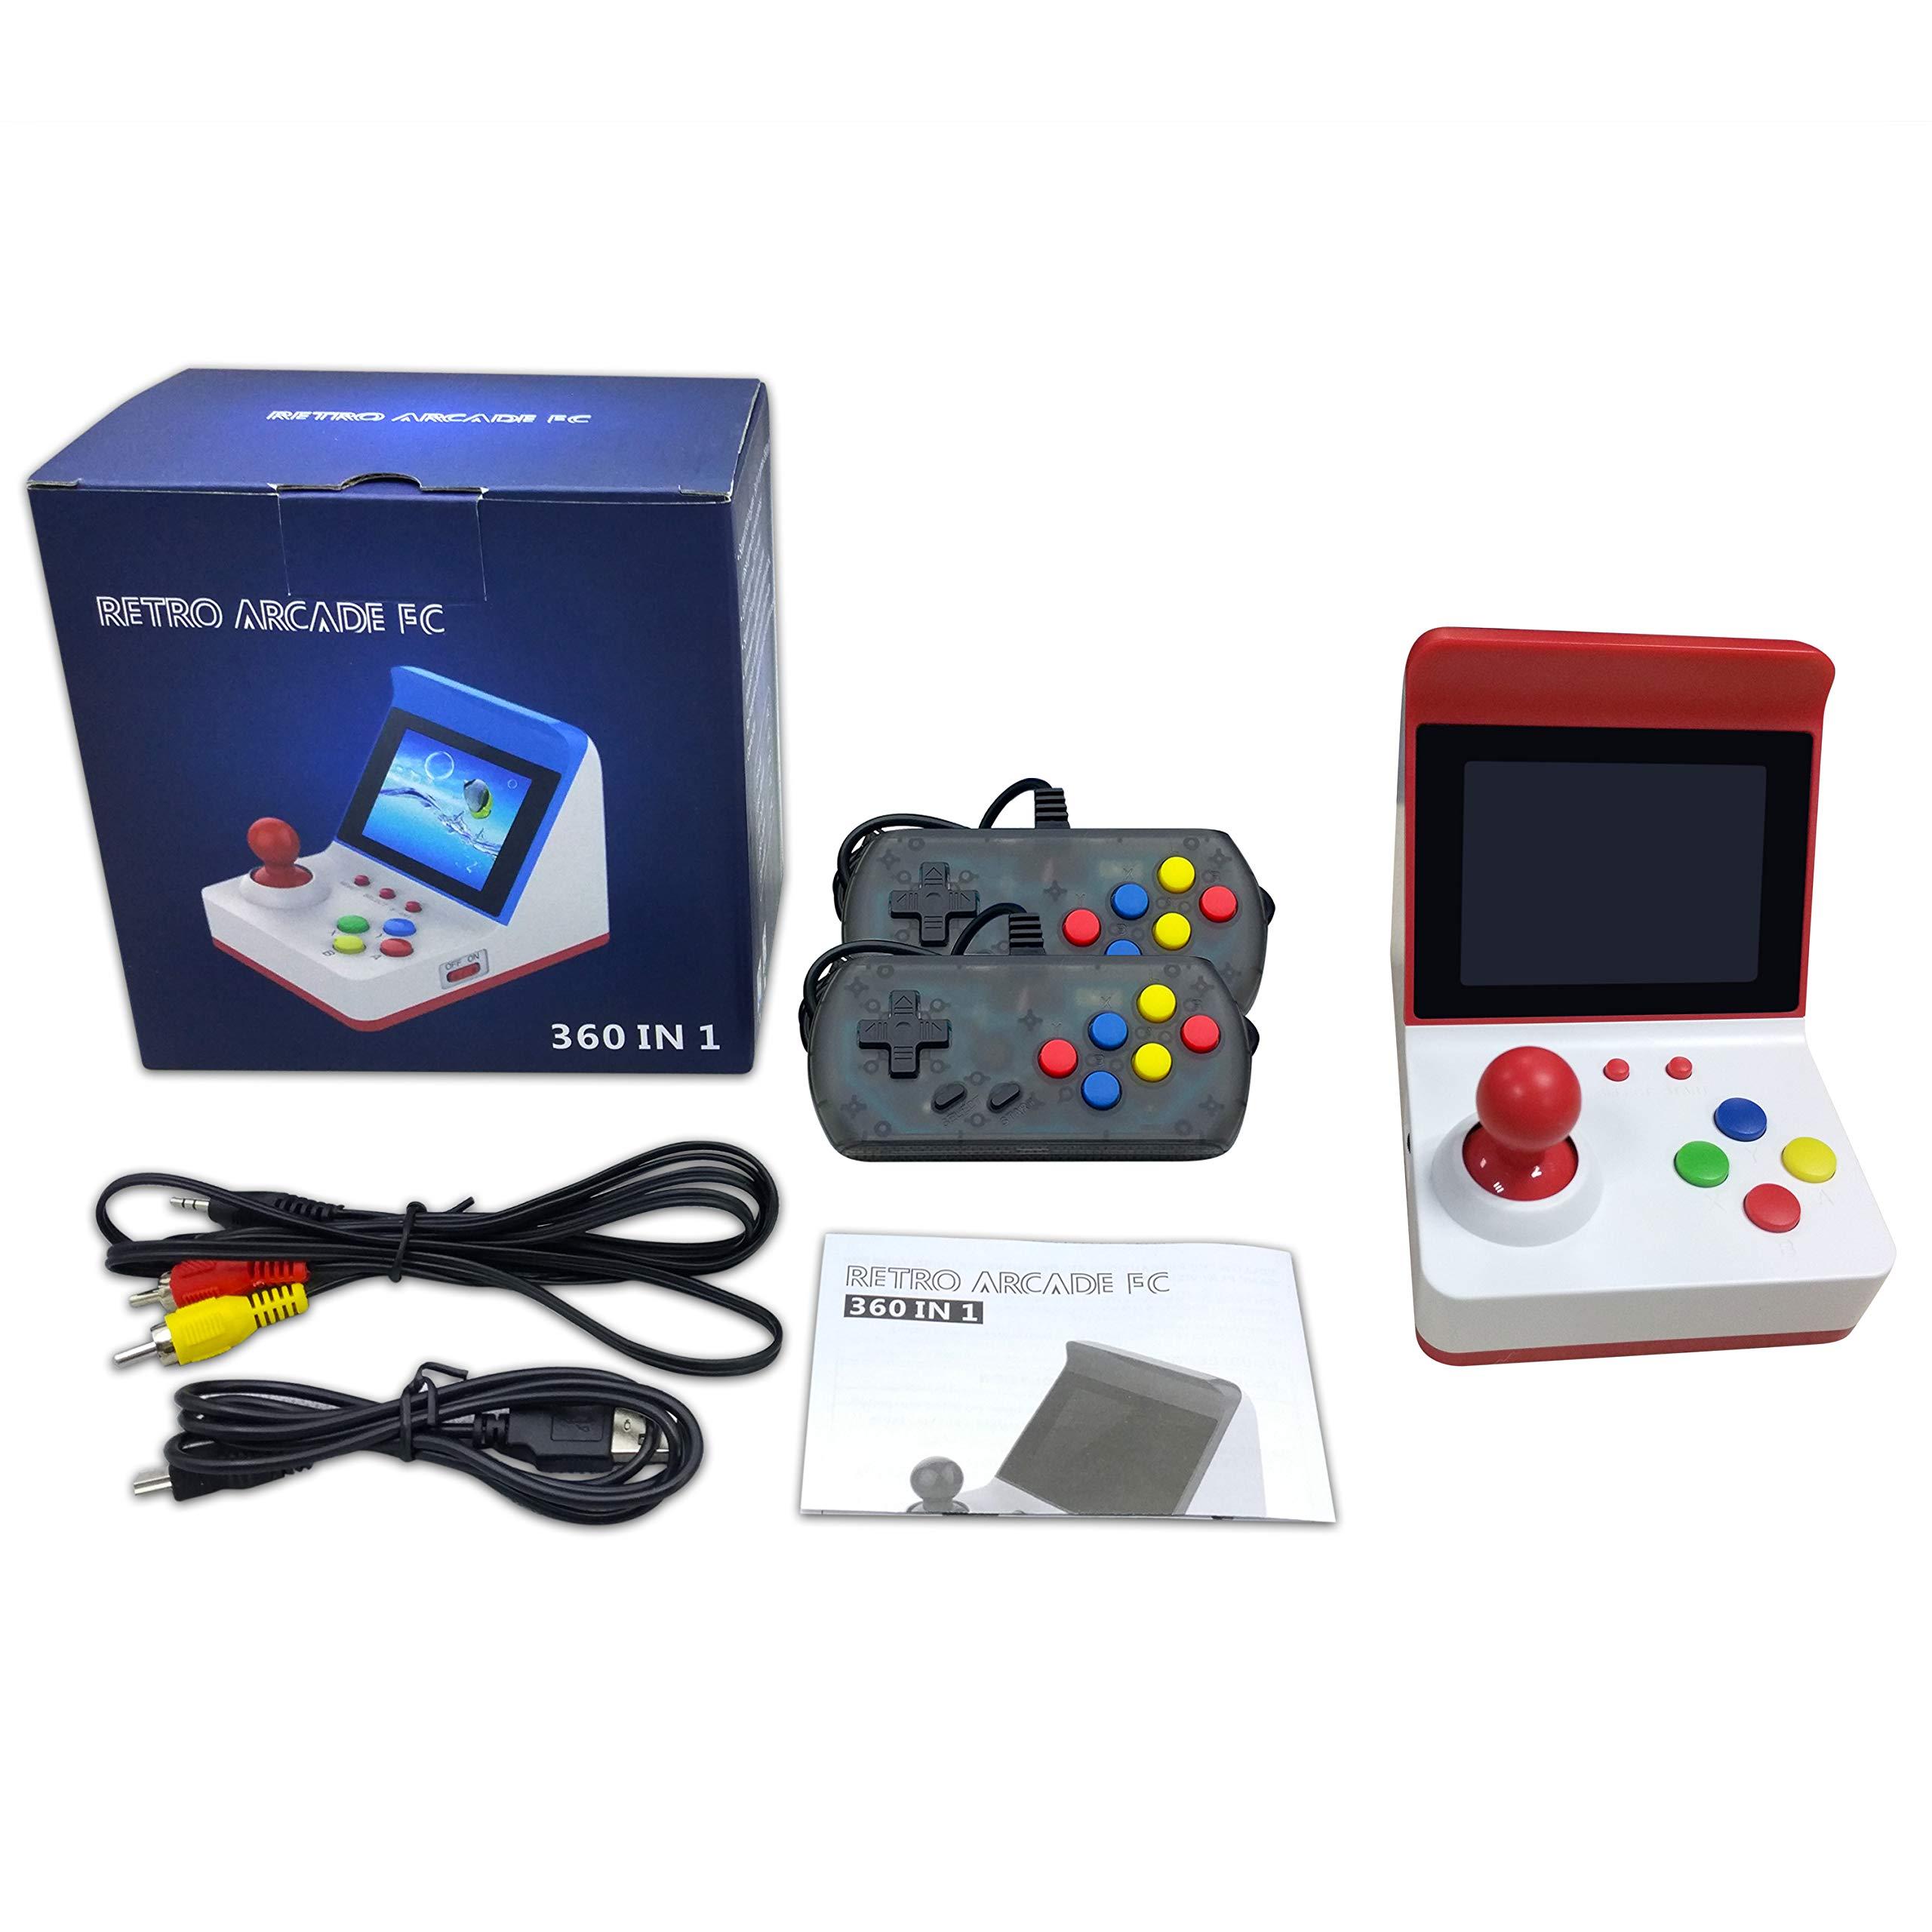 BAORUITENG Handheld Game Console, Retro FC Game Console Video Game Console with 3 Inch 360 Classic Games with 2 Joysticks , Birthday Present for Children (red) by BAORUITENG (Image #7)